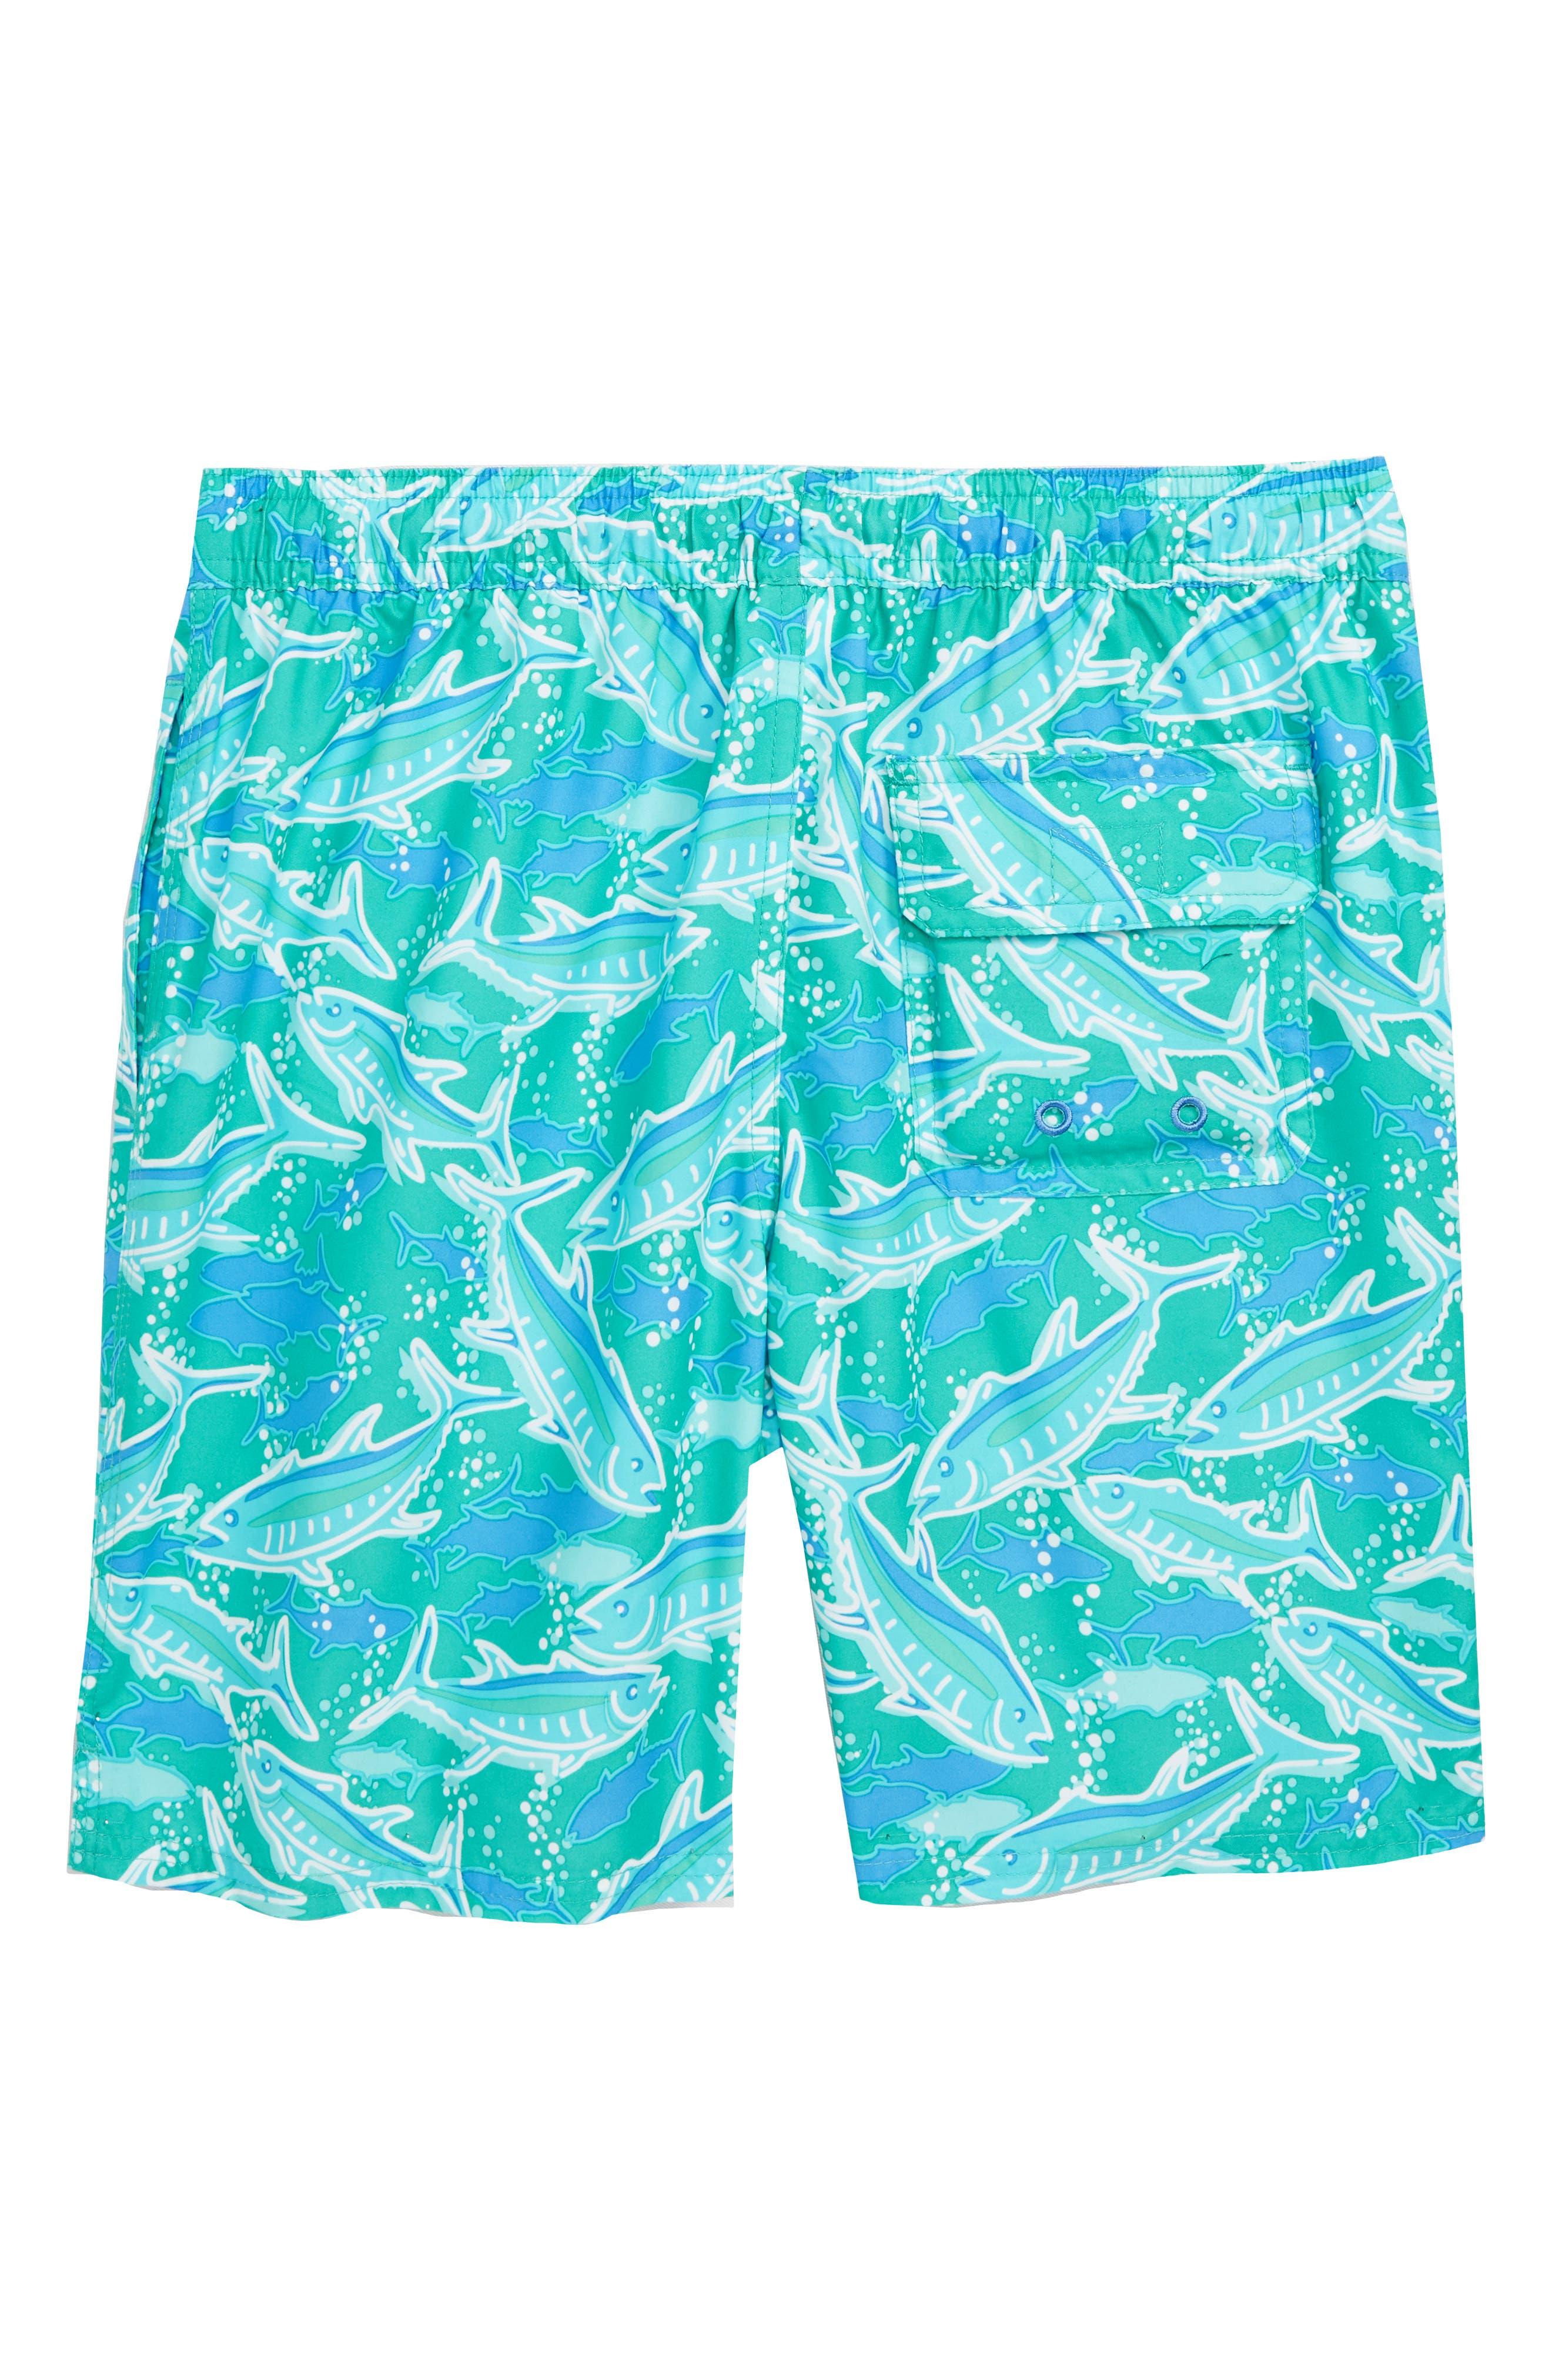 Chappy School of Tuna Swim Trunks,                             Alternate thumbnail 2, color,                             Aquinnah Aqua